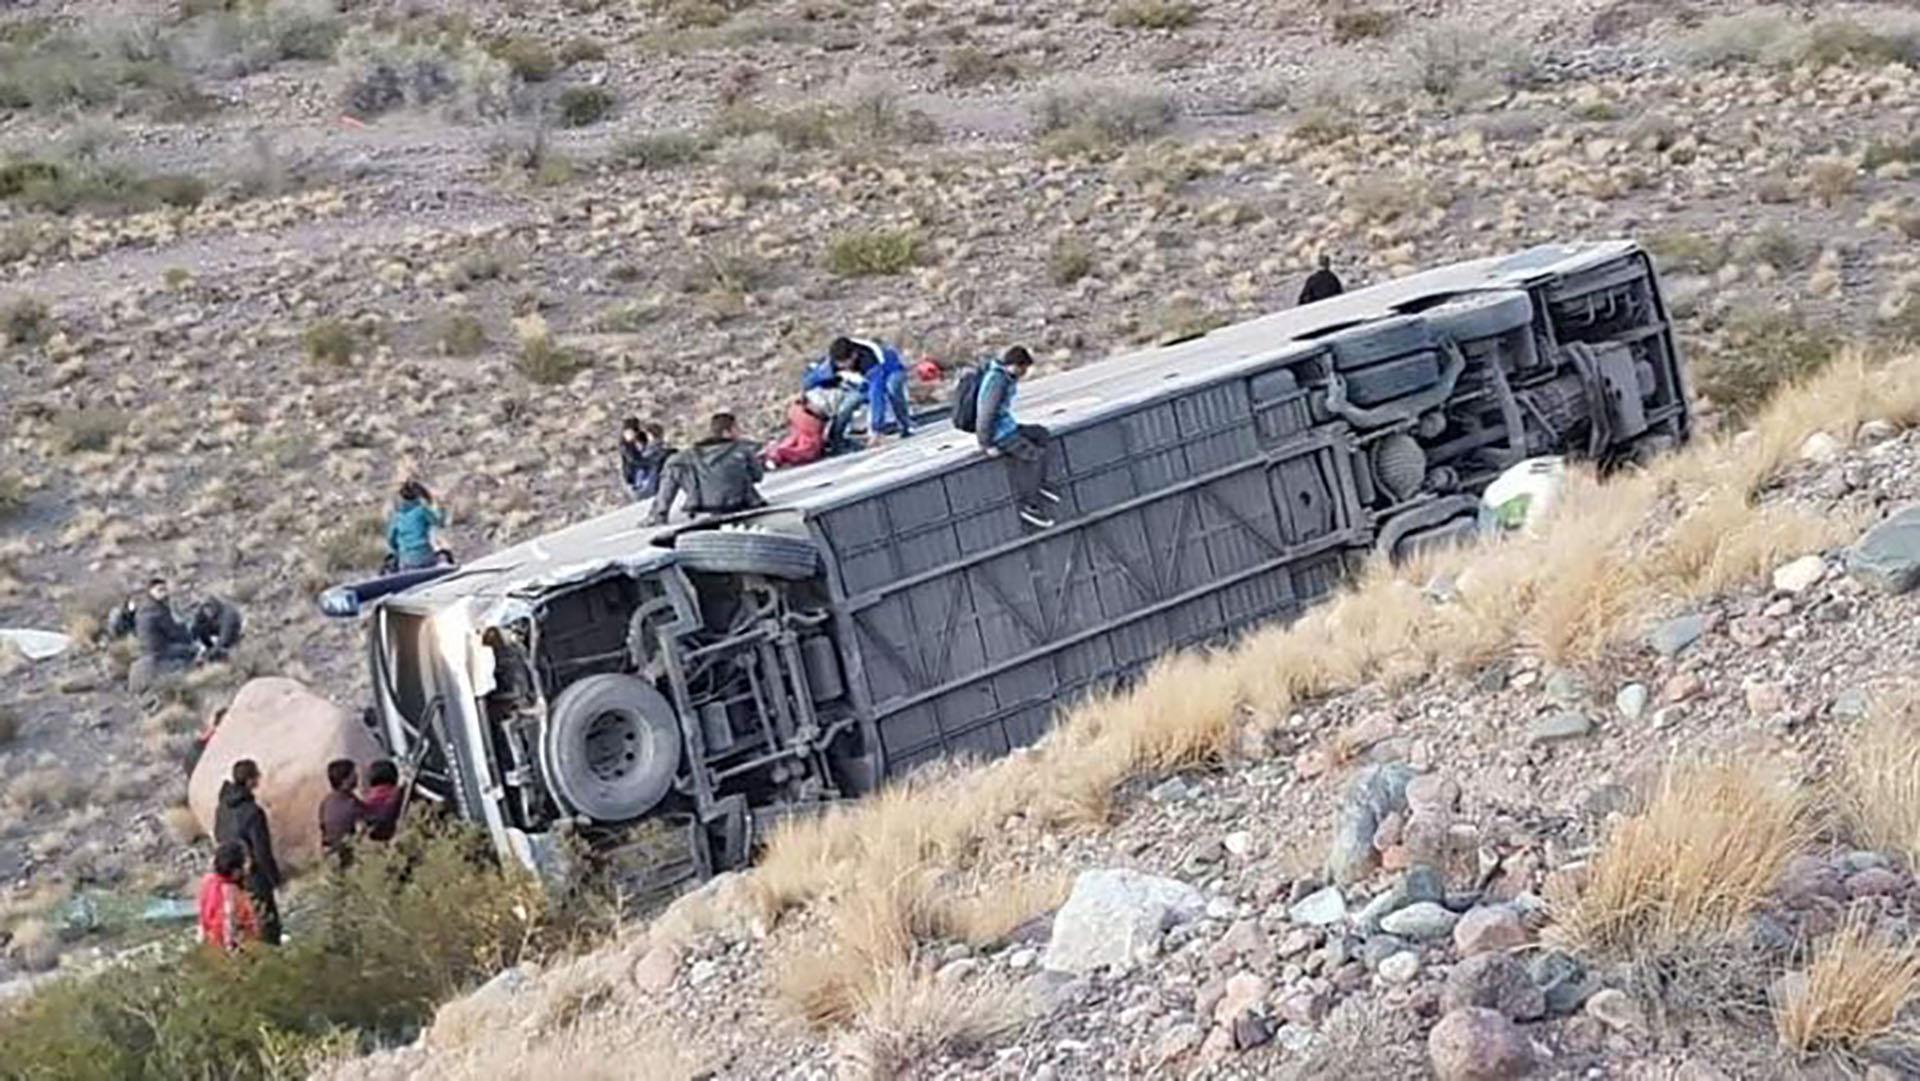 El accidente ocurrió en la ruta 7, a 4 km de Uspallata